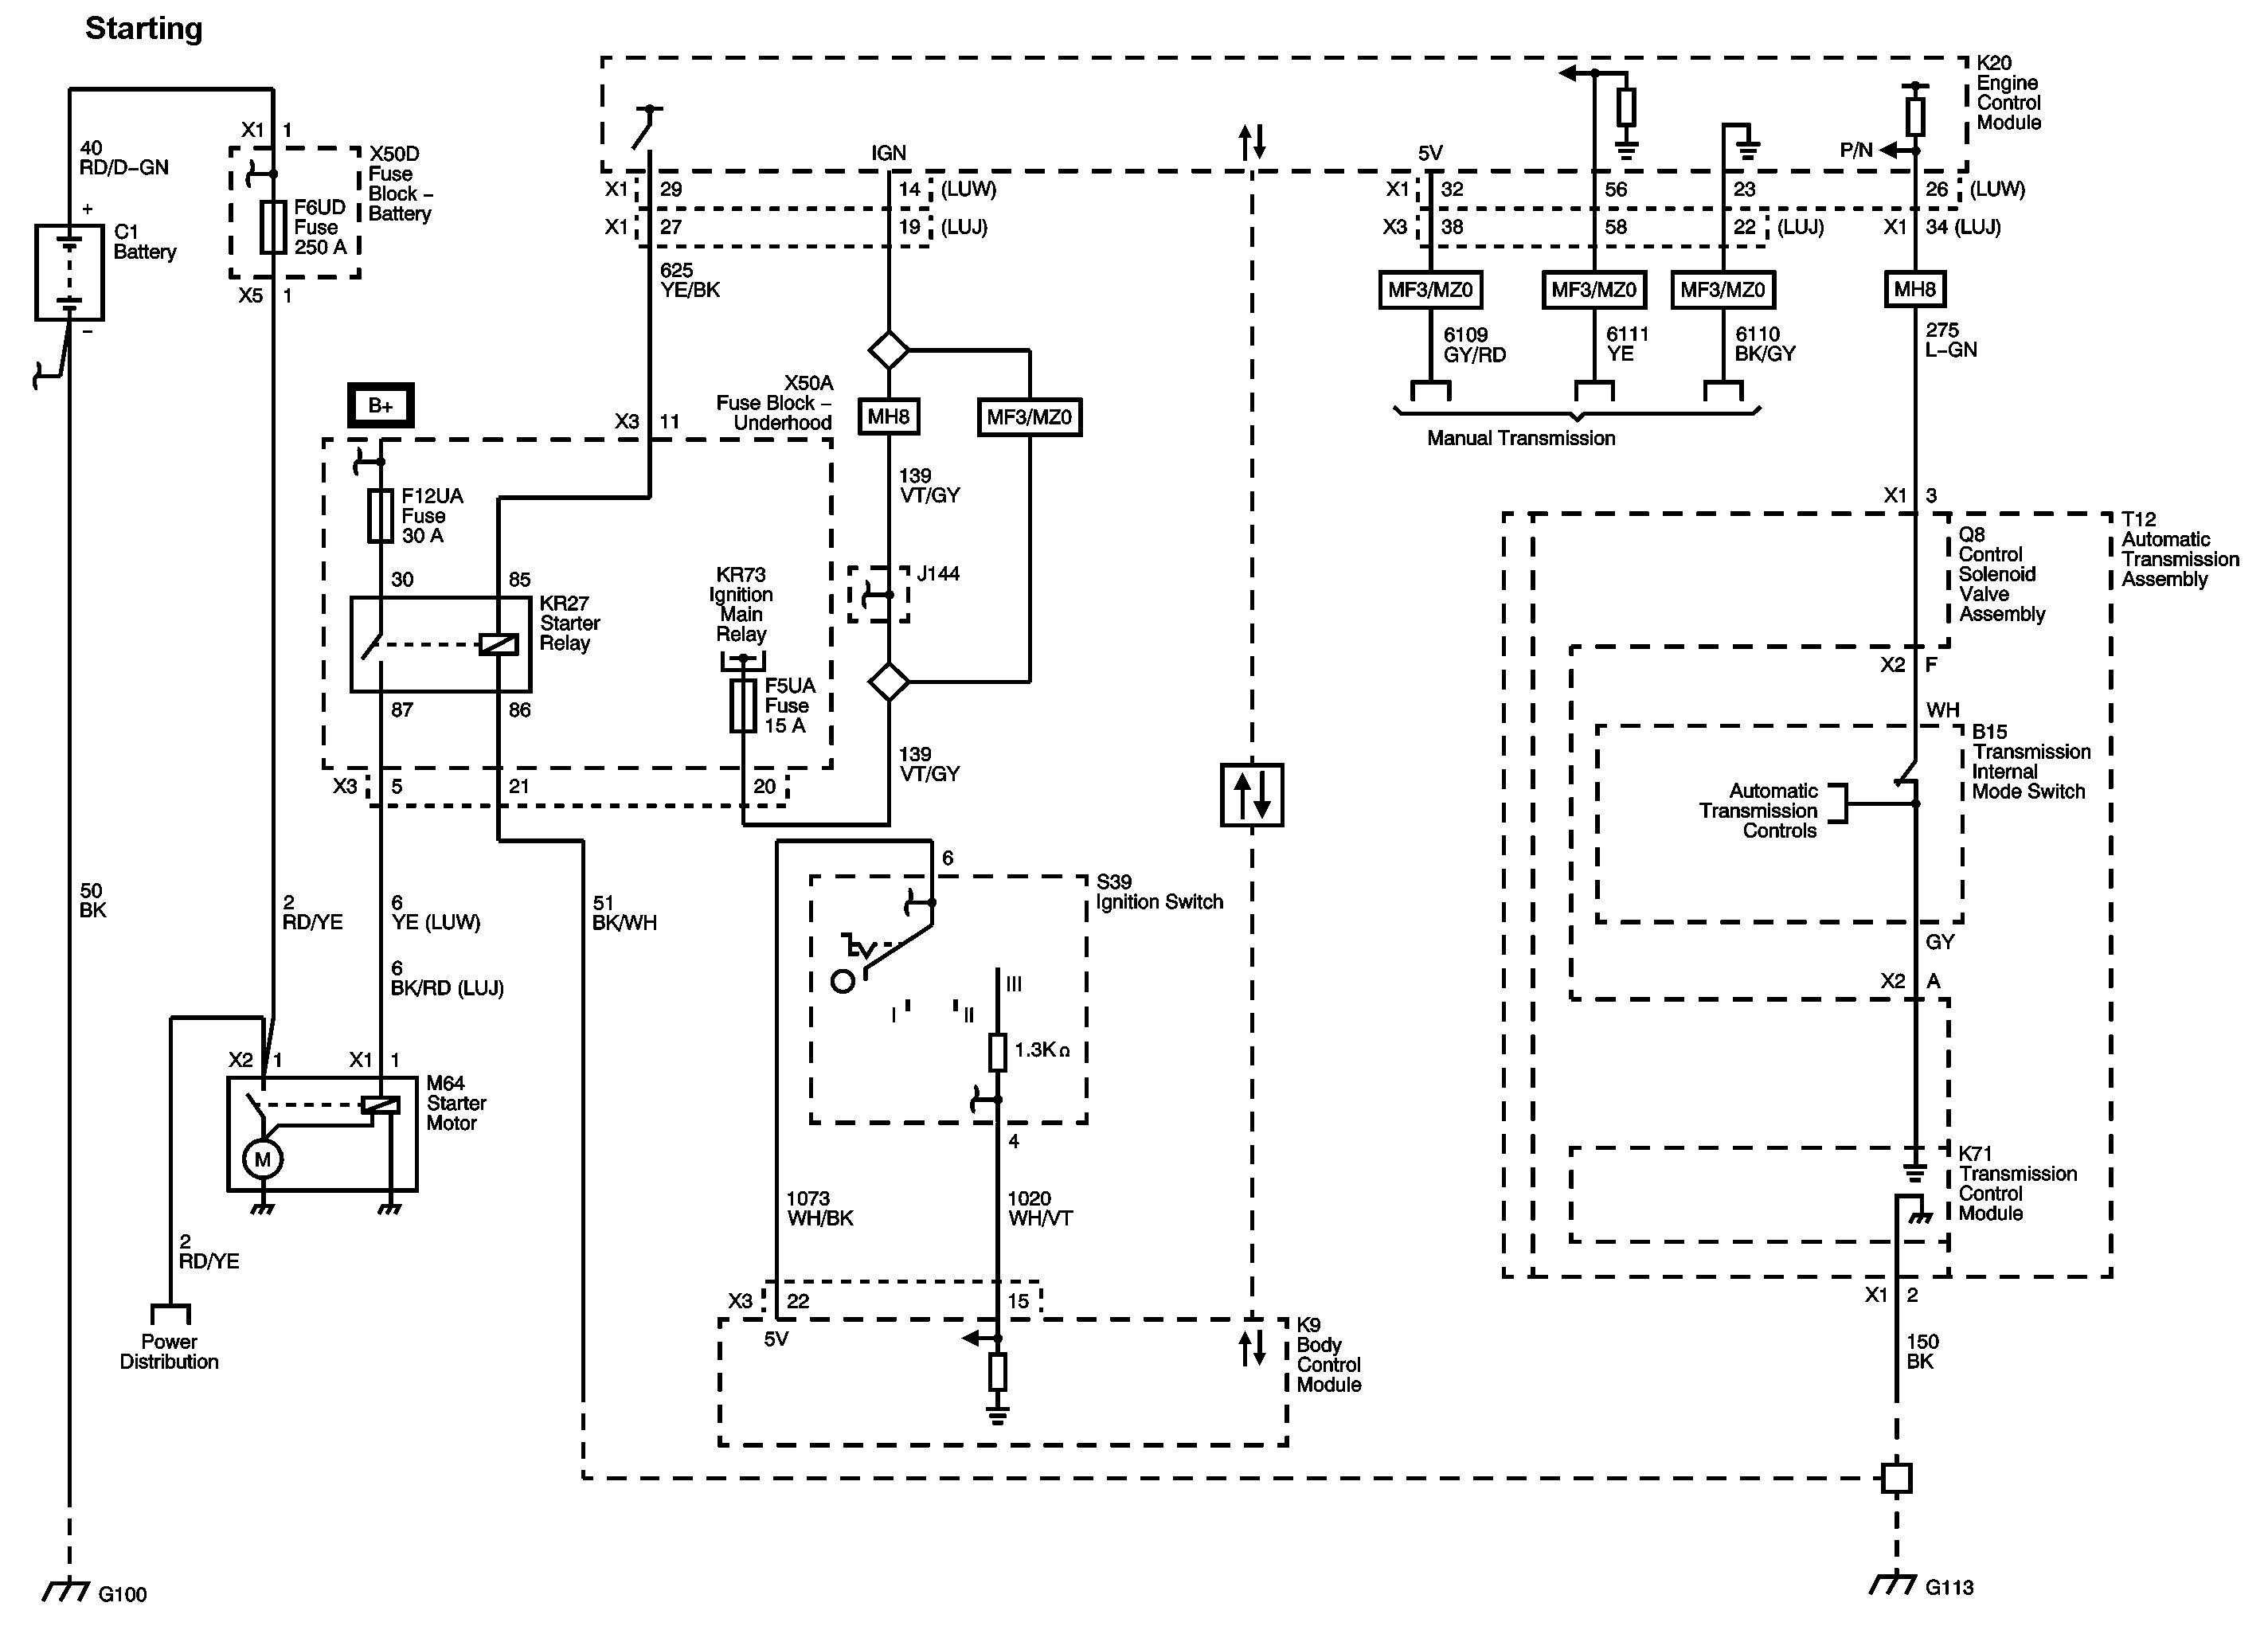 chevy cruze wiring diagrams - wiring diagram bear-tablet -  bear-tablet.pennyapp.it  pennyapp.it